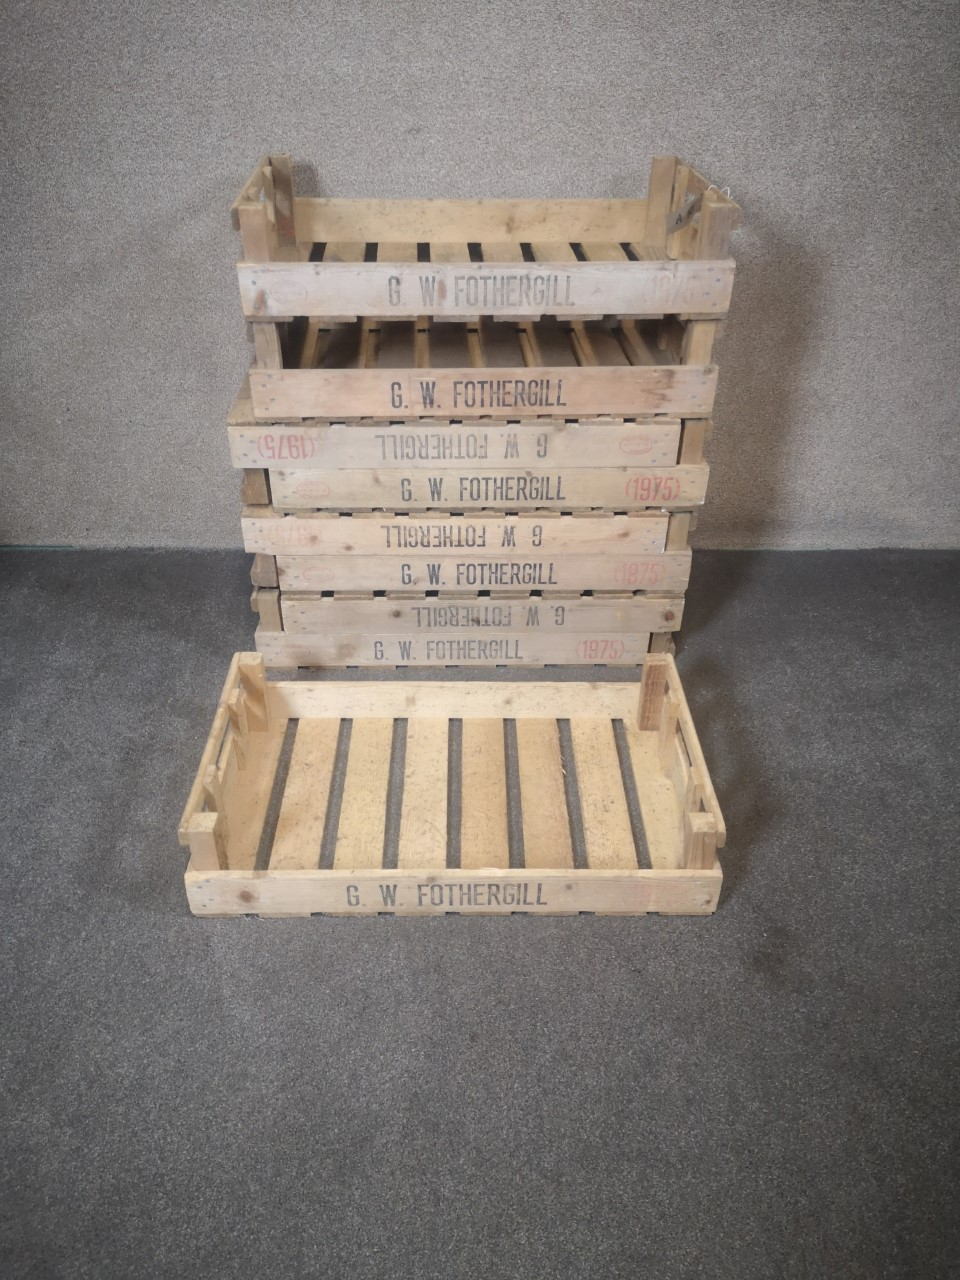 Potato crates画像